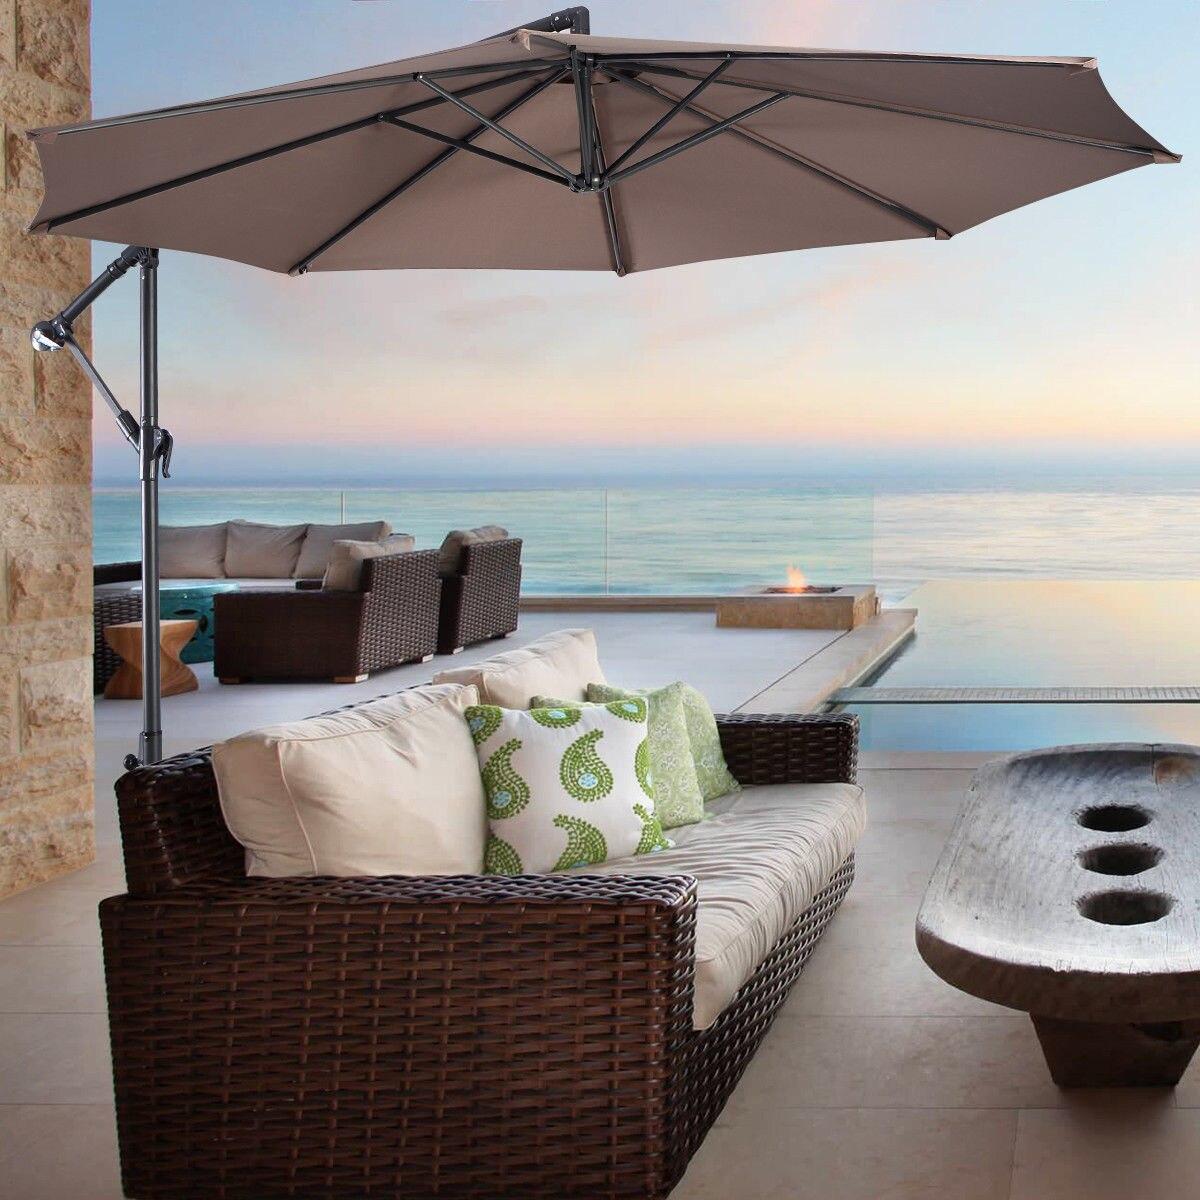 Costway 10' Hanging Umbrella Patio Sun Shade Offset Outdoor Market W/t Cross Base (Tan)|  - title=